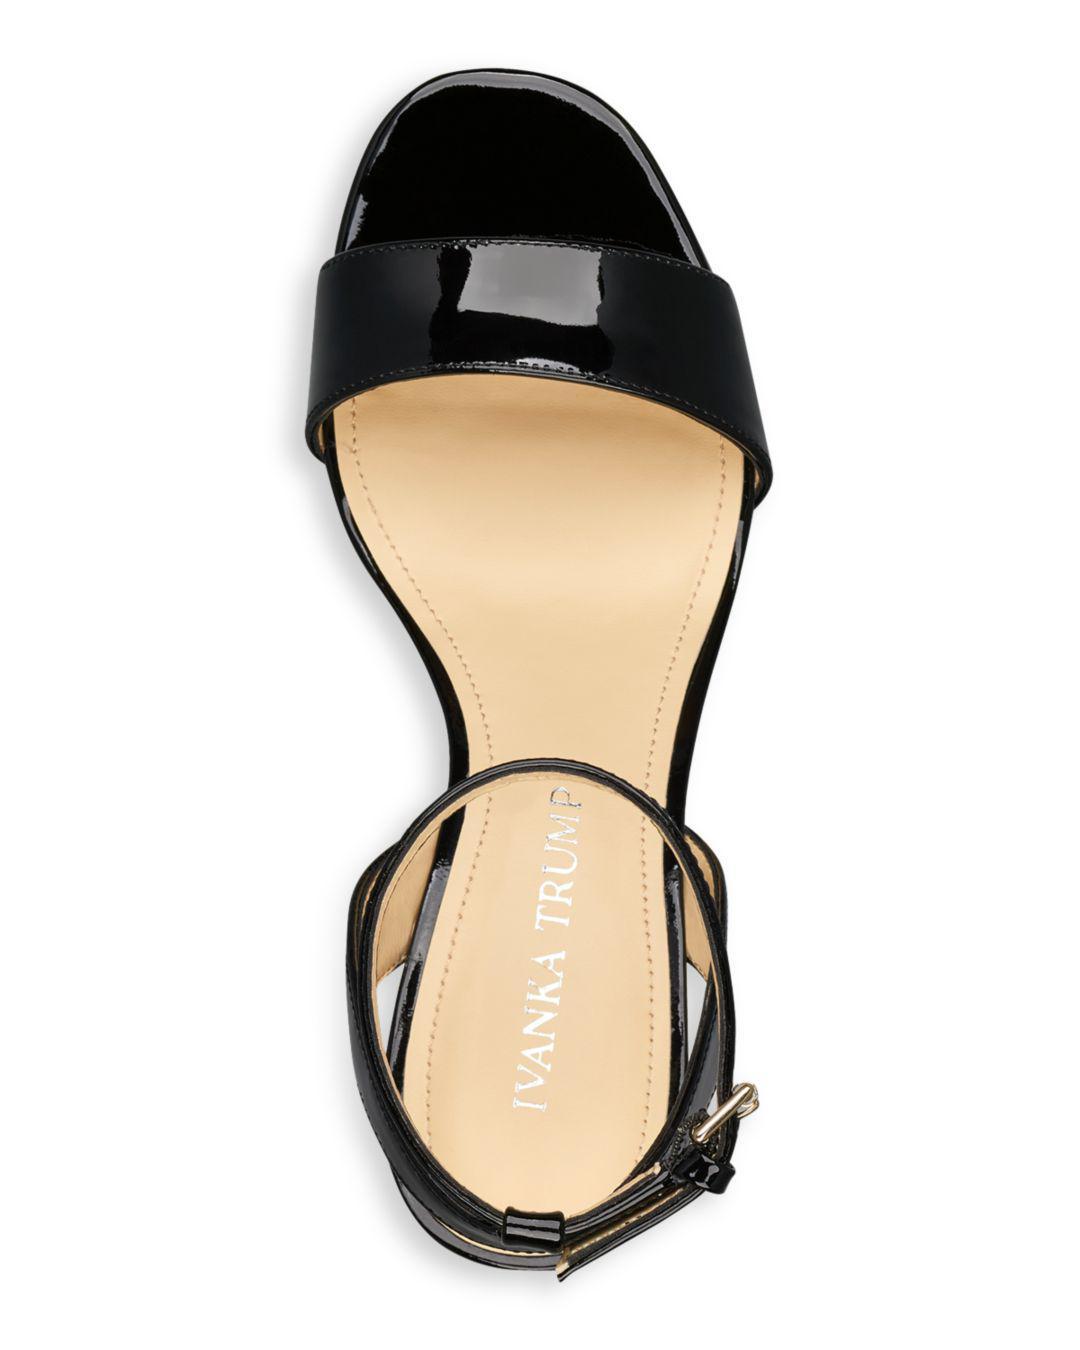 d6b6544dc02 Lyst - Ivanka Trump Women s Anina Patent Leather Ankle Strap Sandals ...